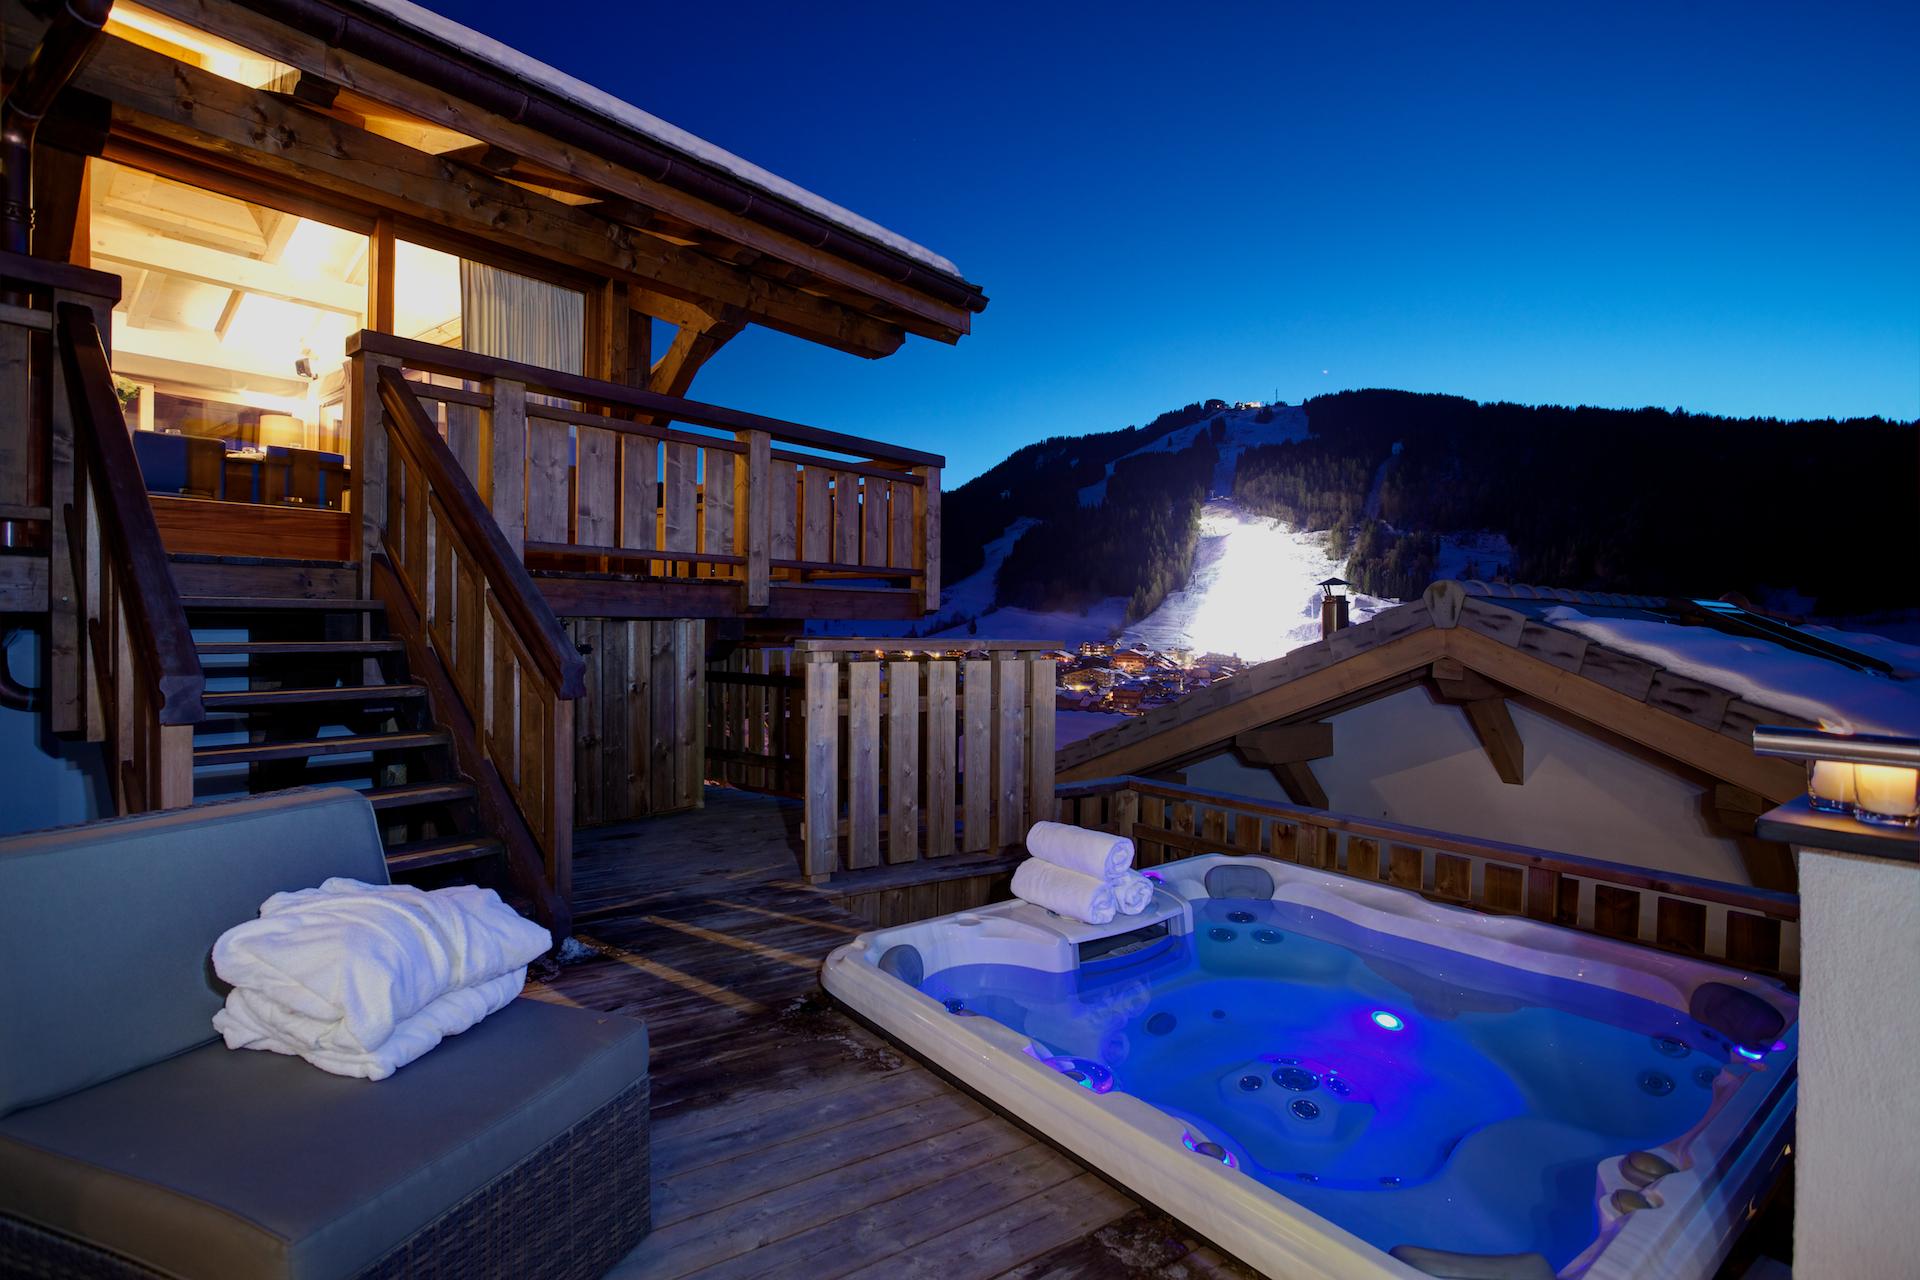 Hot tub, Chalet Bouquetin, Morzine